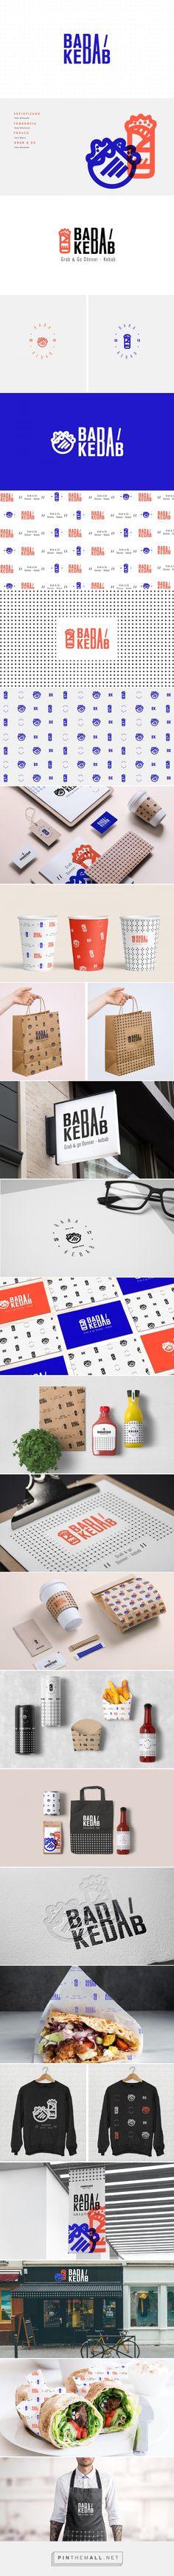 BABA KEBAB Restaurant Branding by Lina Bassiouny | Fivestar Branding Agency – Design and Branding Agency & Curated Inspiration Gallery #restaurant #restaurantbranding #branding #brand #design #foodpackaging #packaging #designinspiration #brandinginspiration